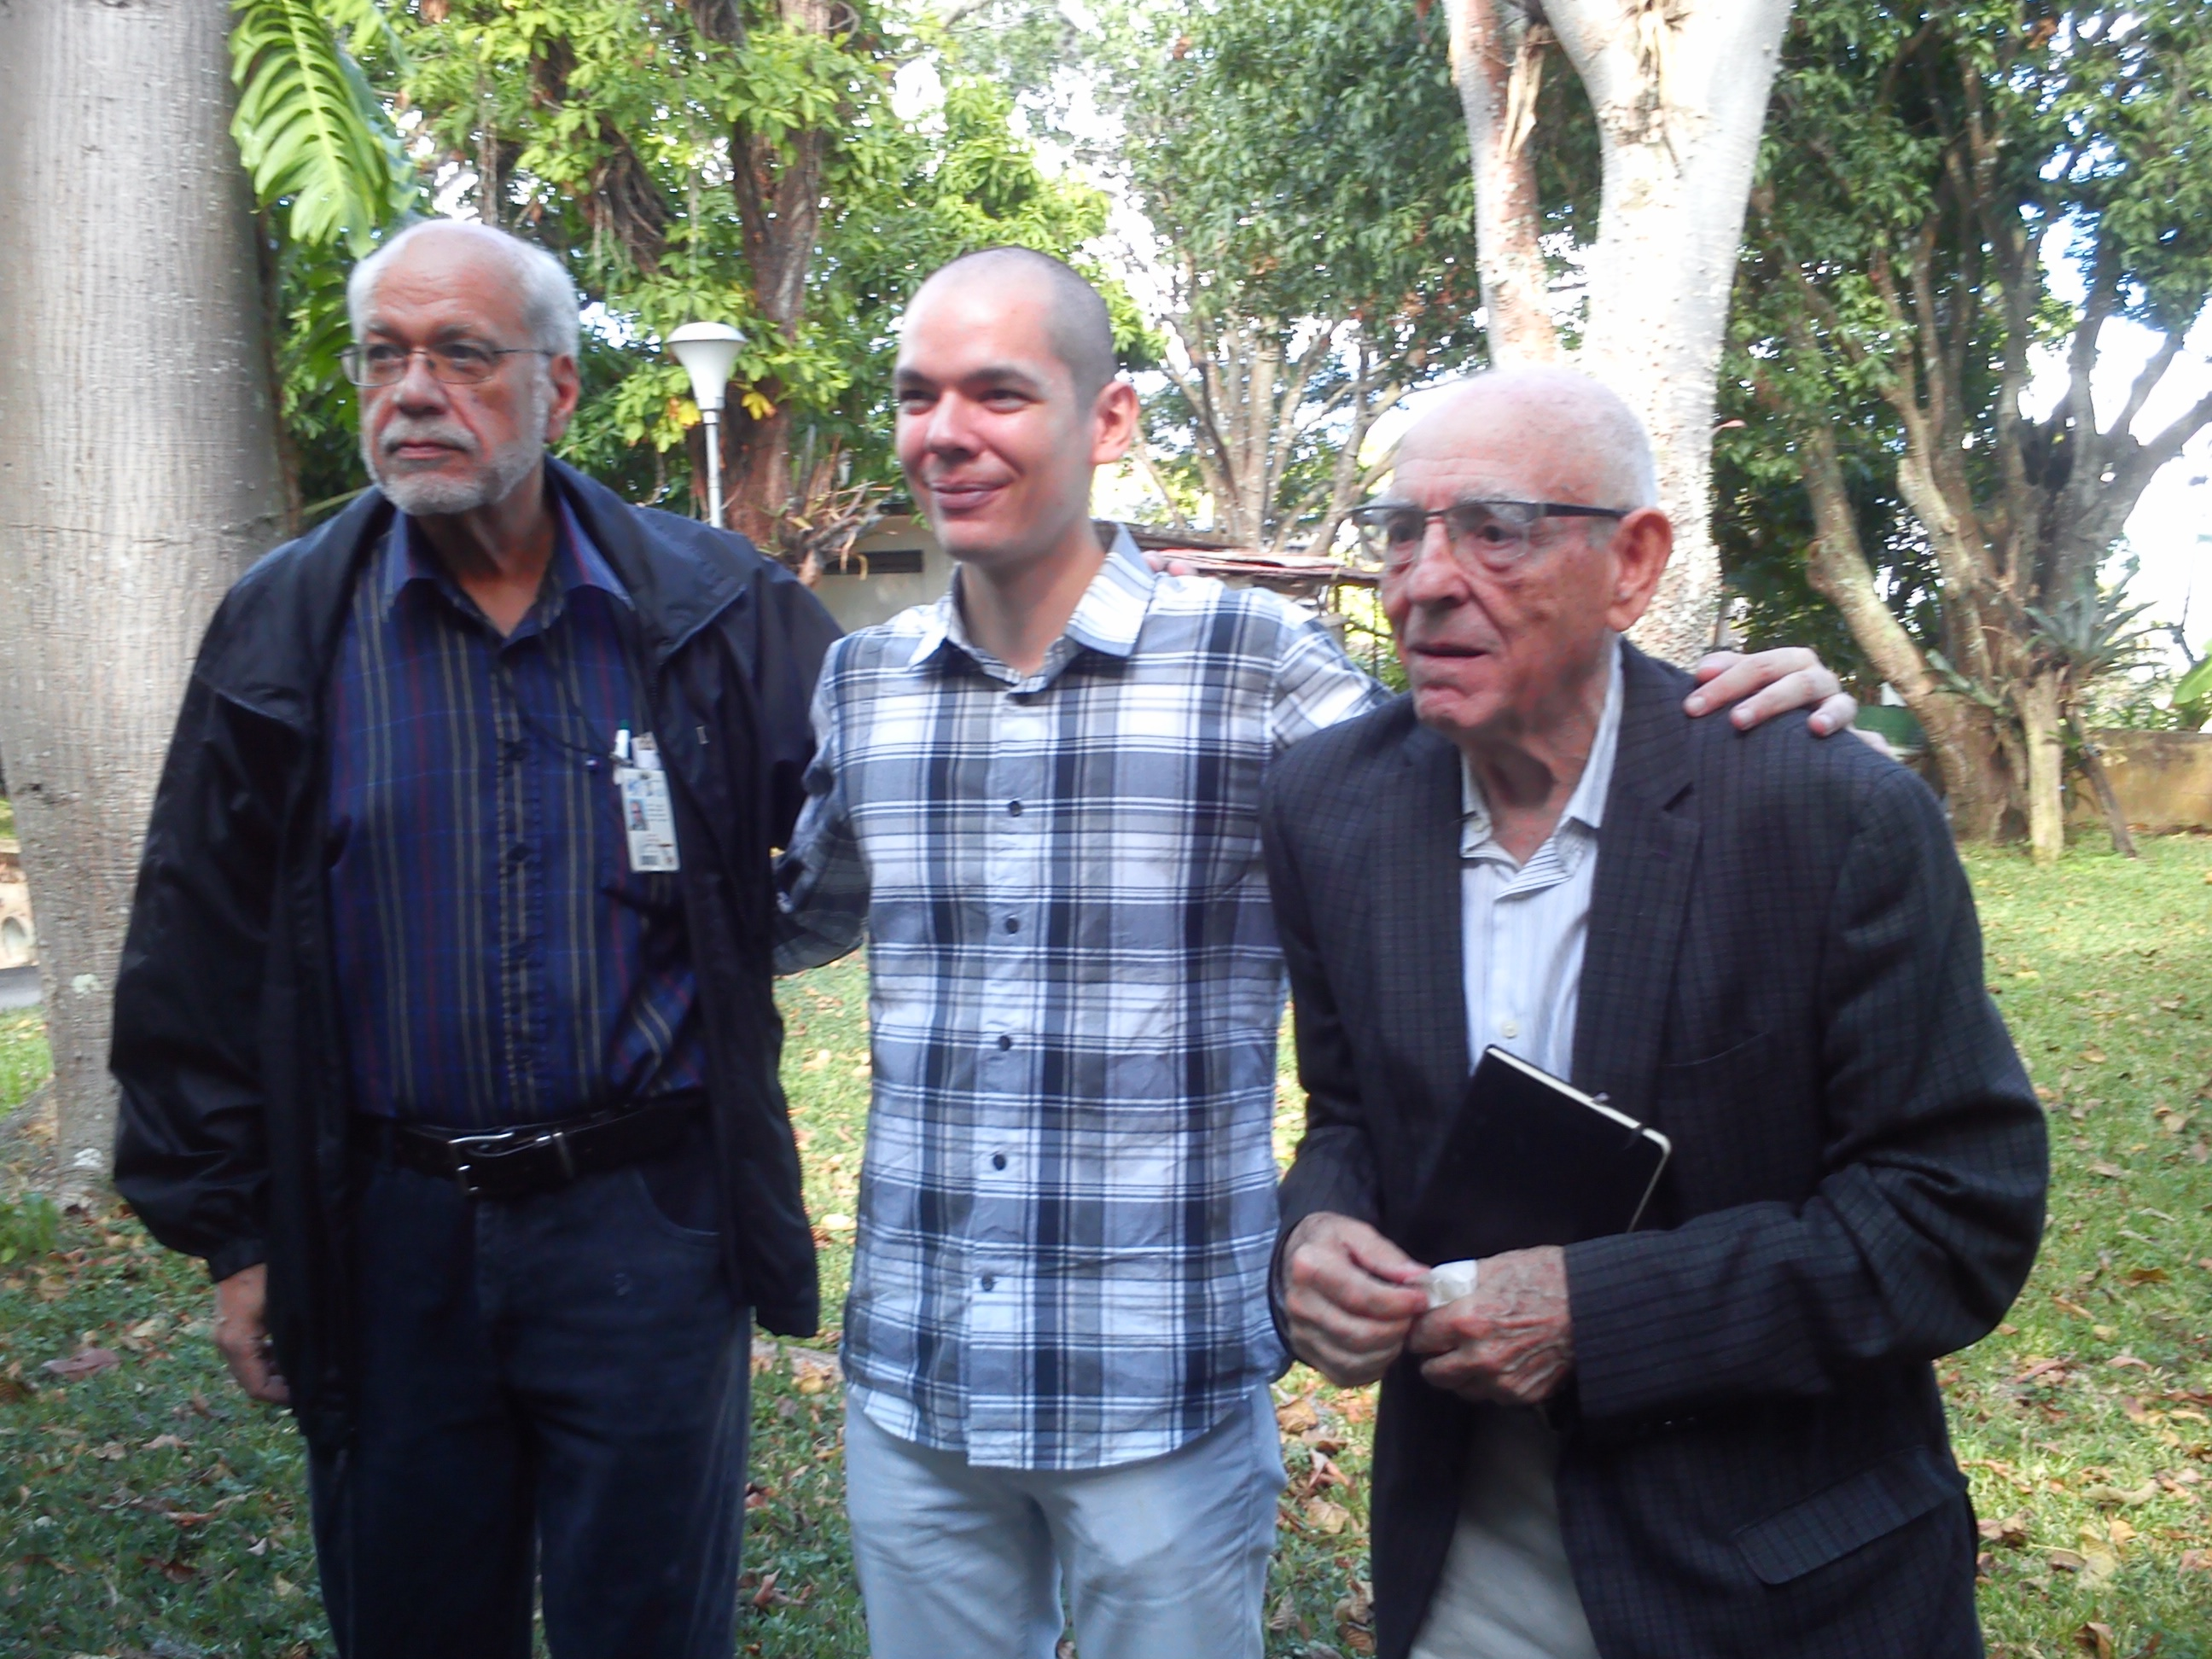 Raúl Padrón, Sebastian Duno & Carlo Caputo - February 2, 2018